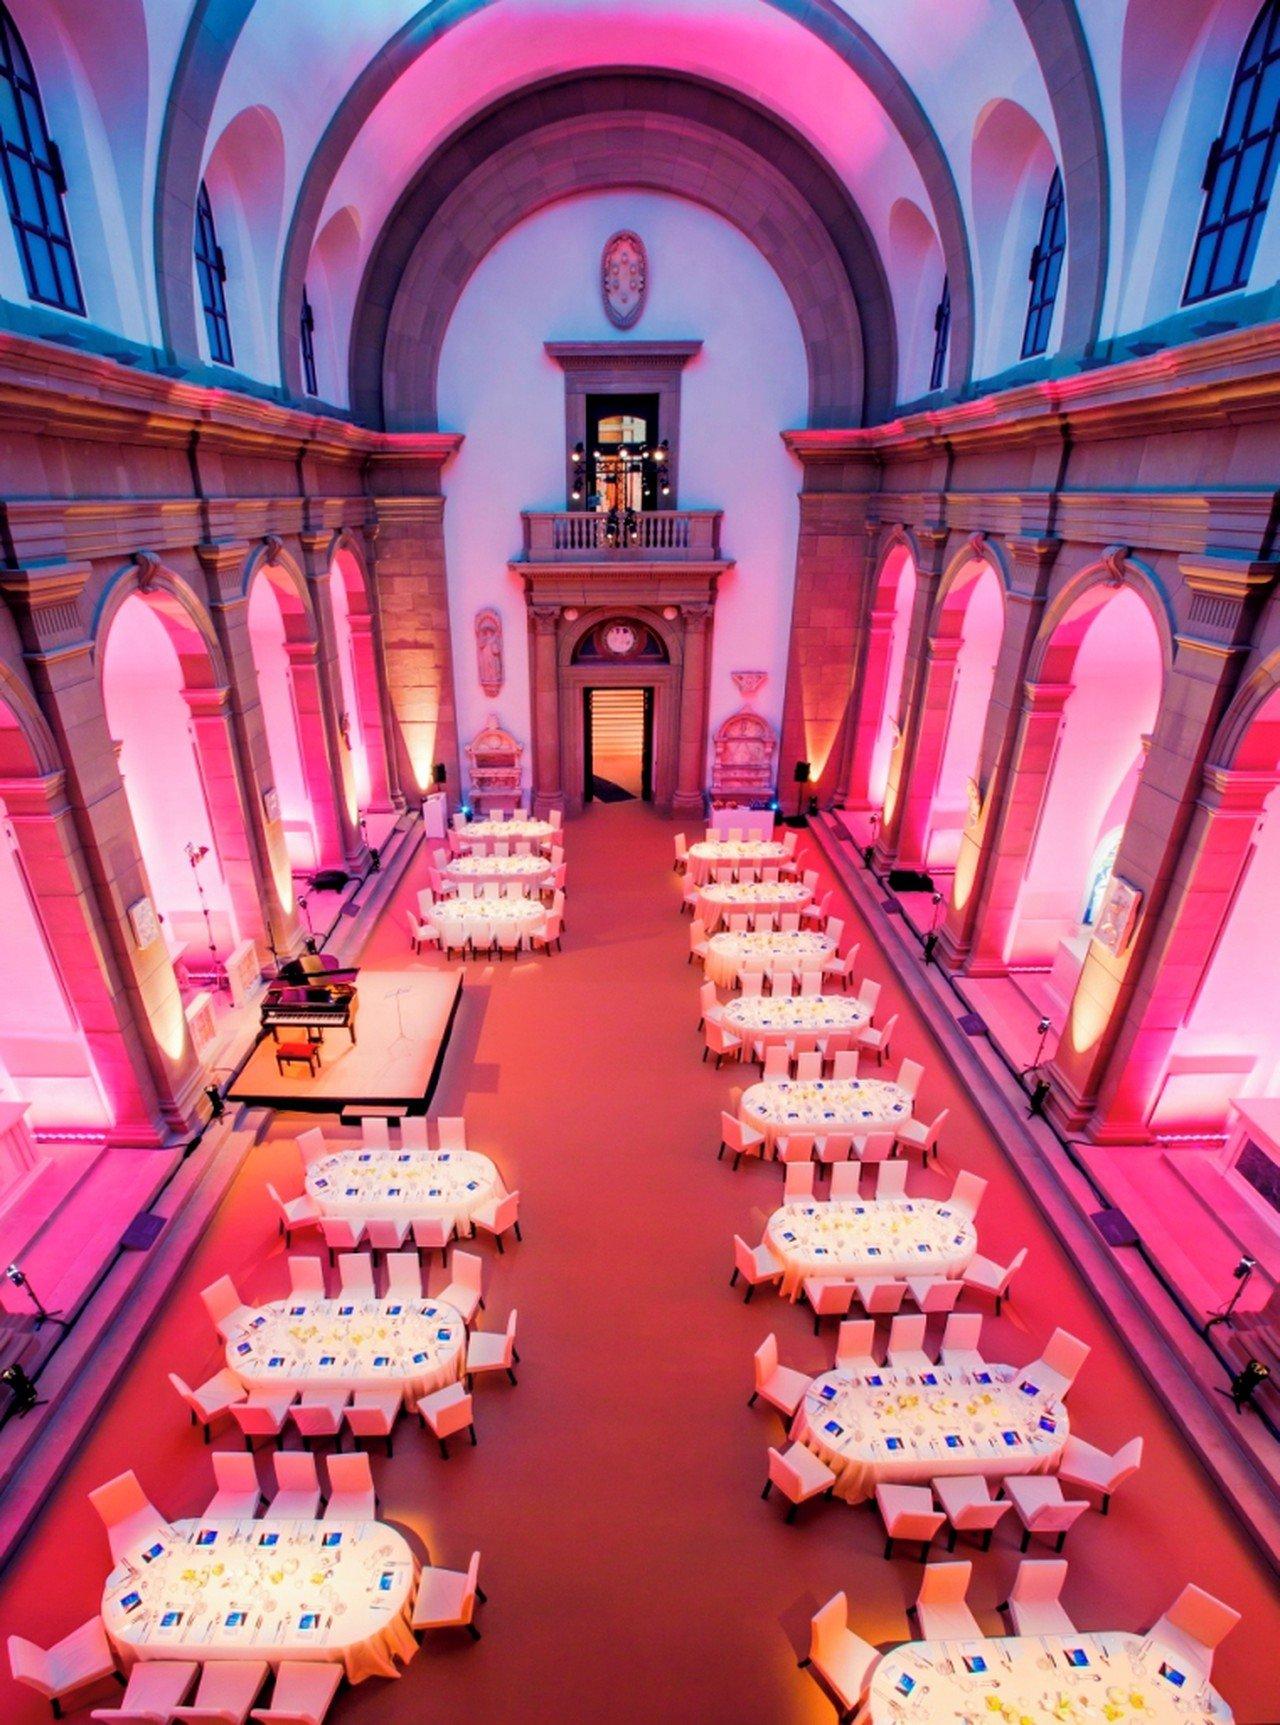 Berlin corporate event venues Musée Bode Museum image 0